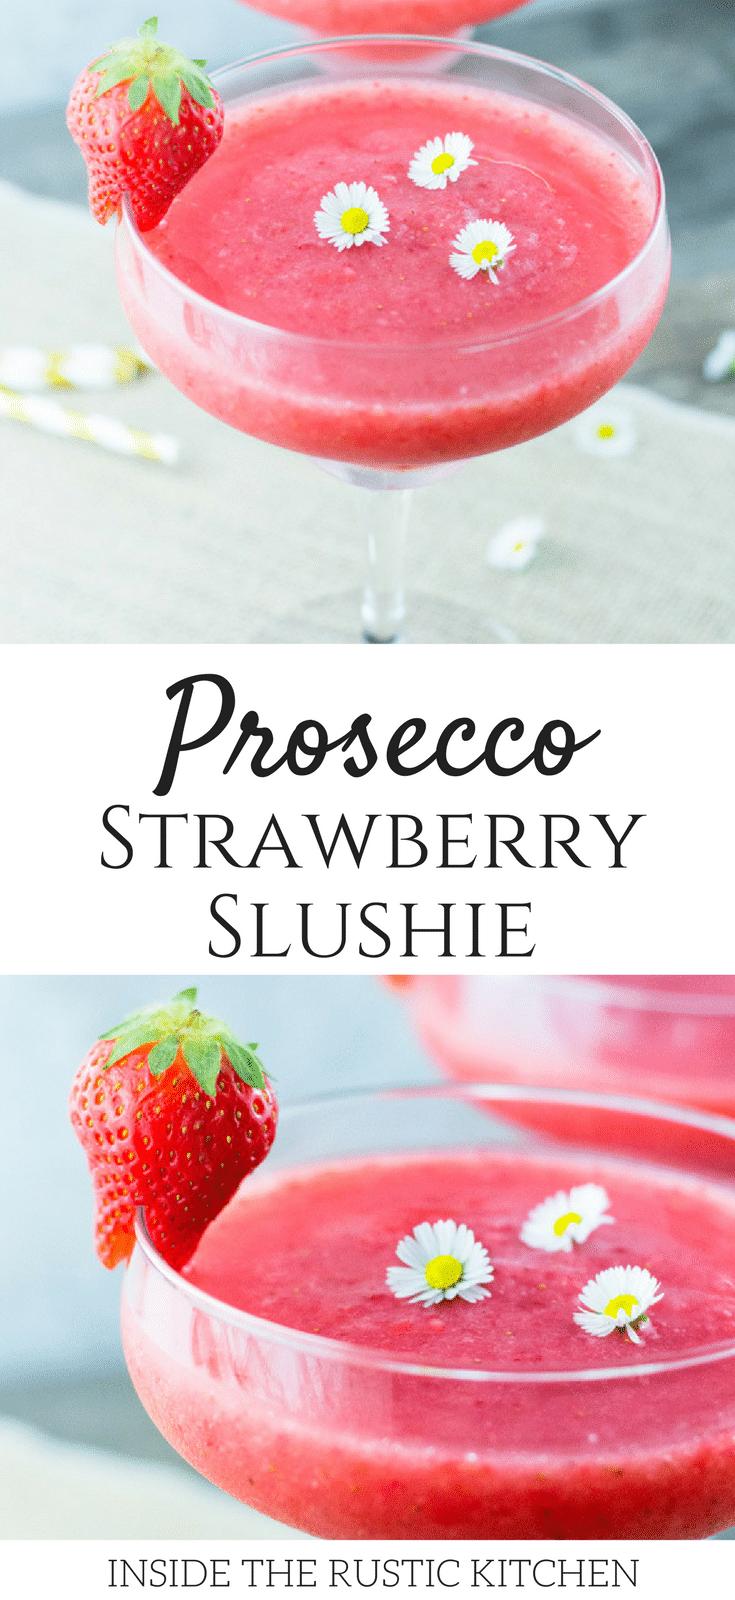 Prosecco Strawberry Slushie | Rezept | Pinterest | Eis, Getränke und ...